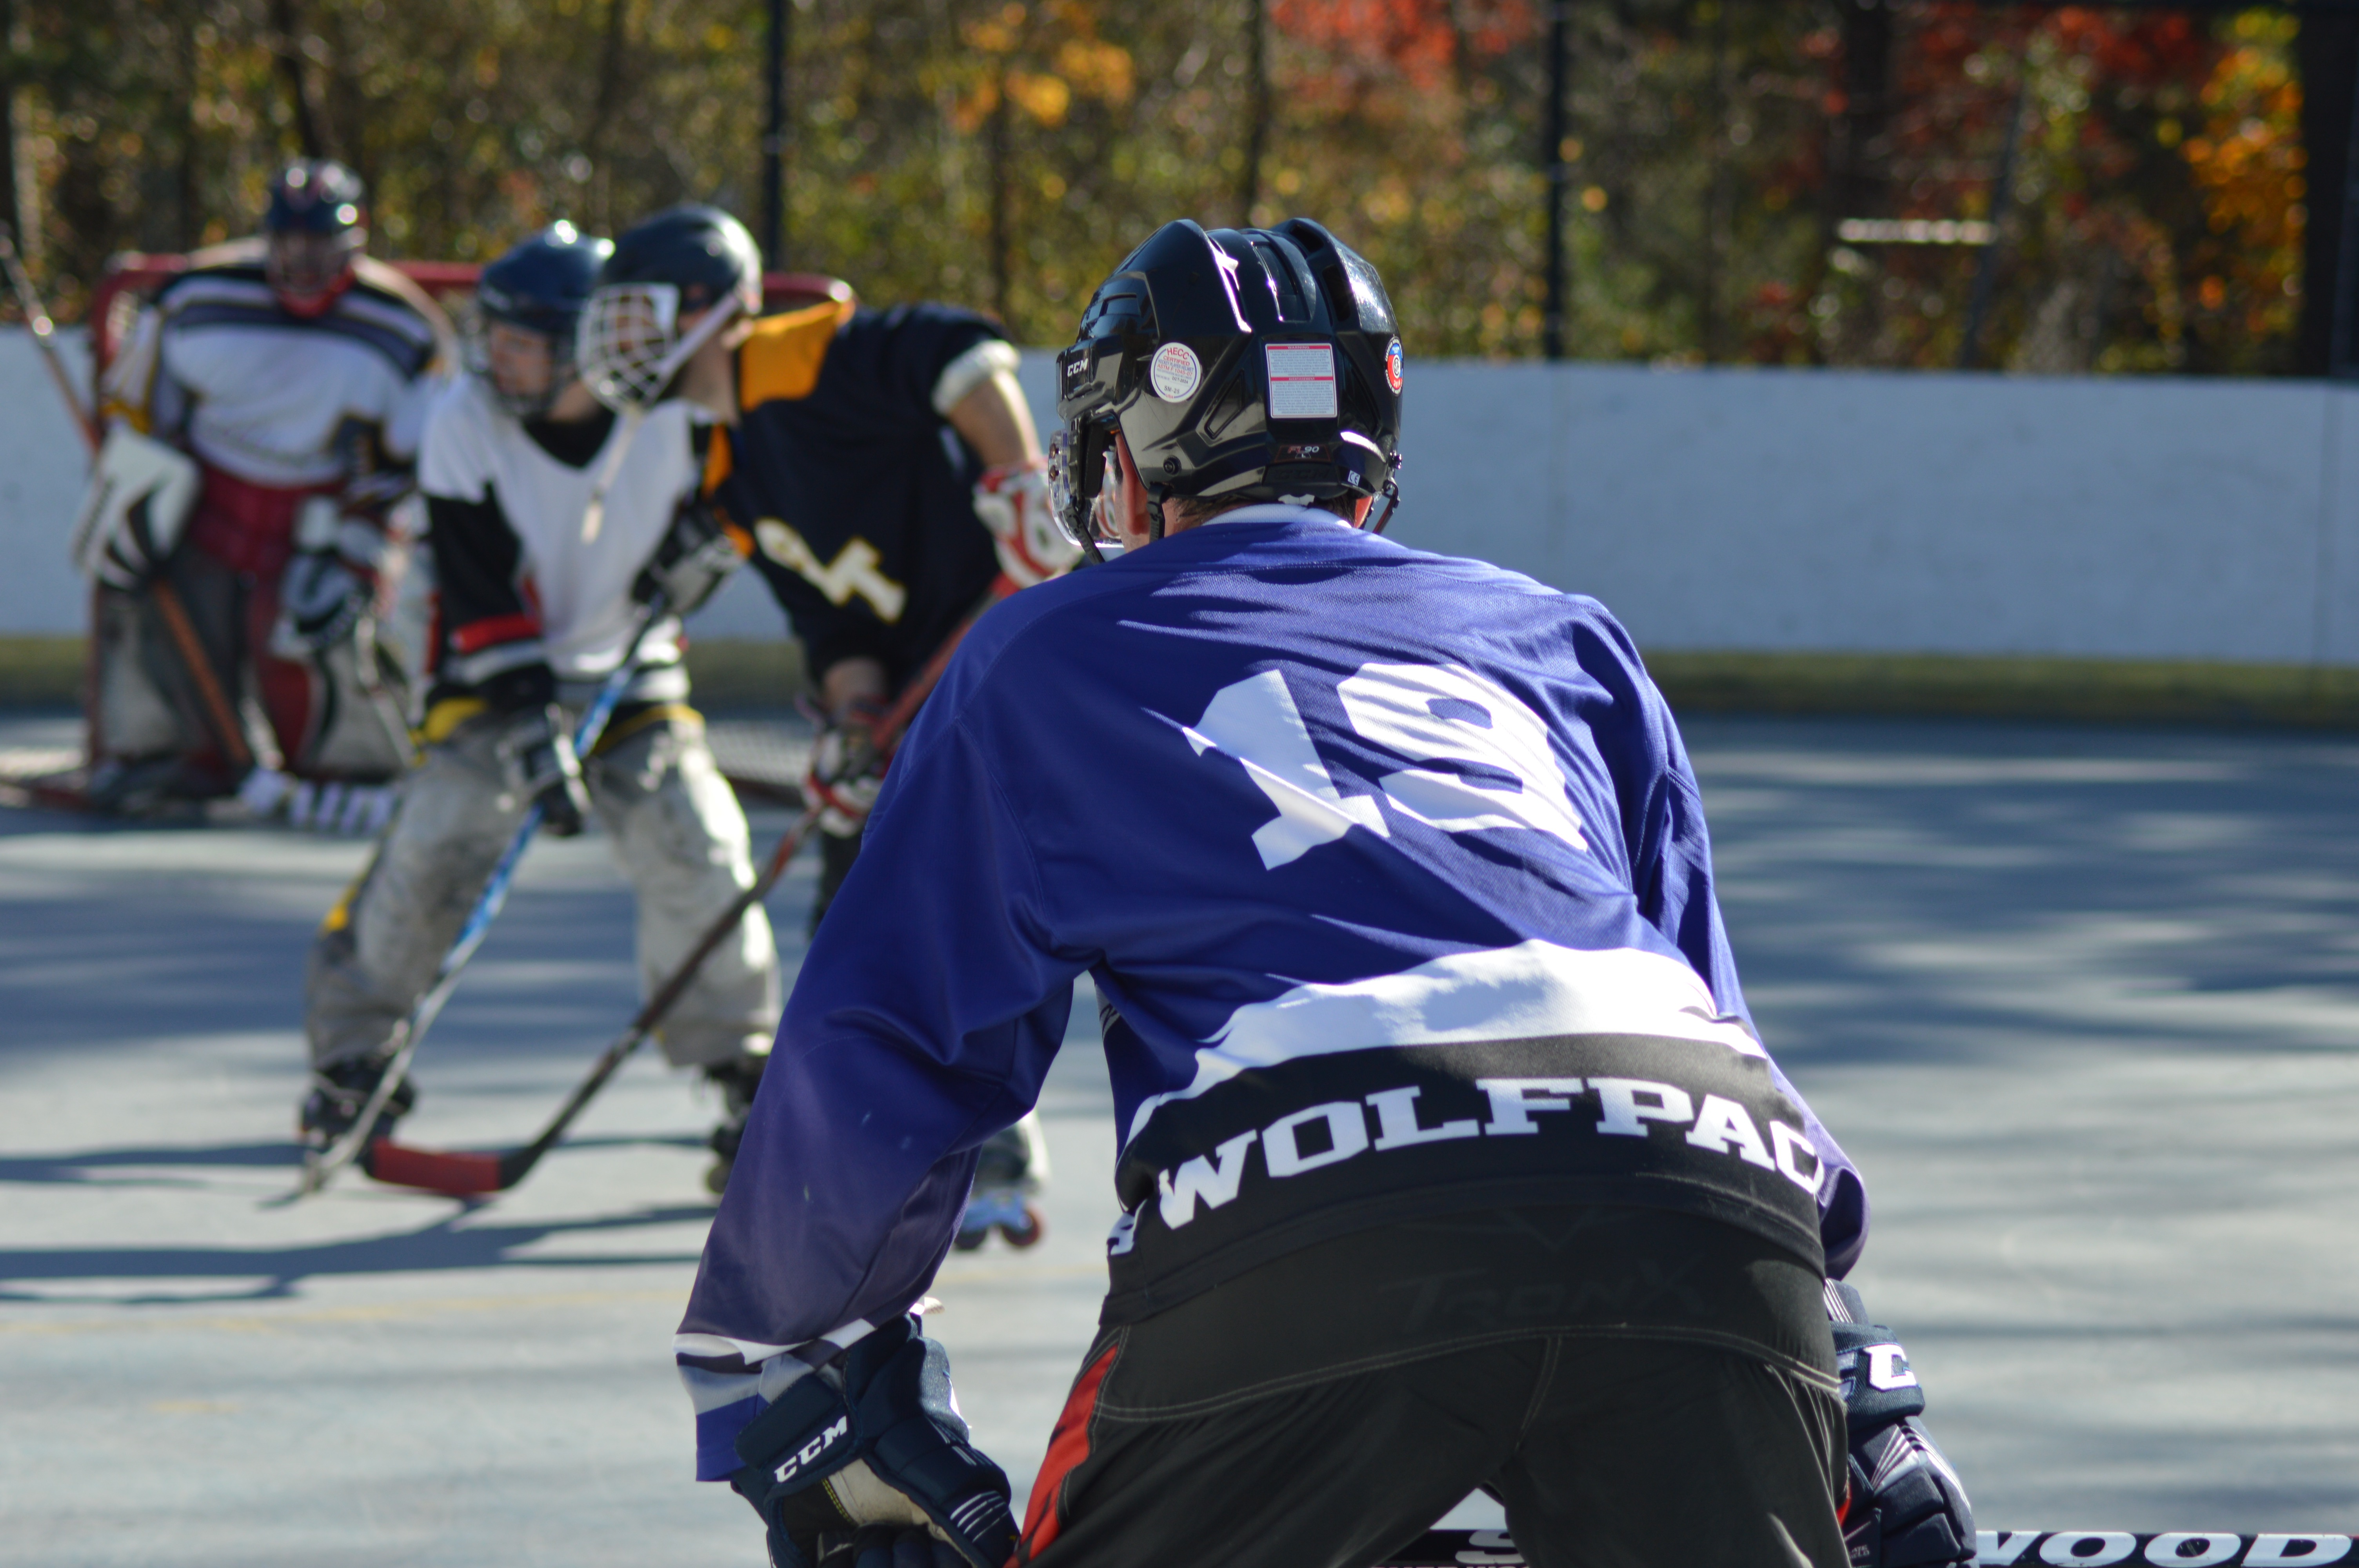 Alexandria Roller Hockey League takes to the concrete